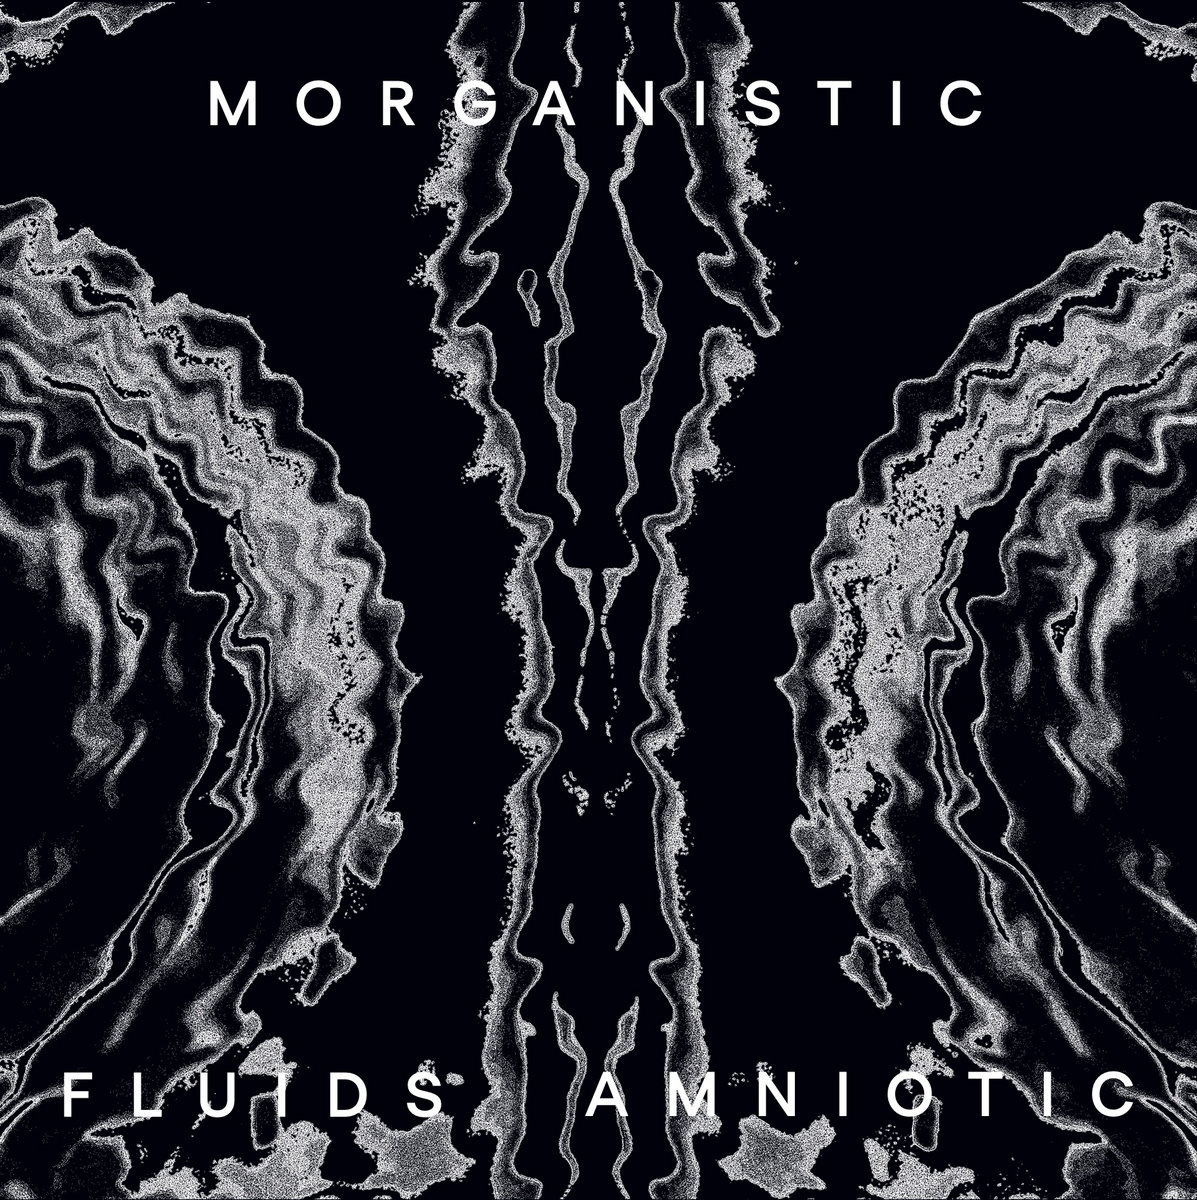 Morganistic - Fluids Amniotic